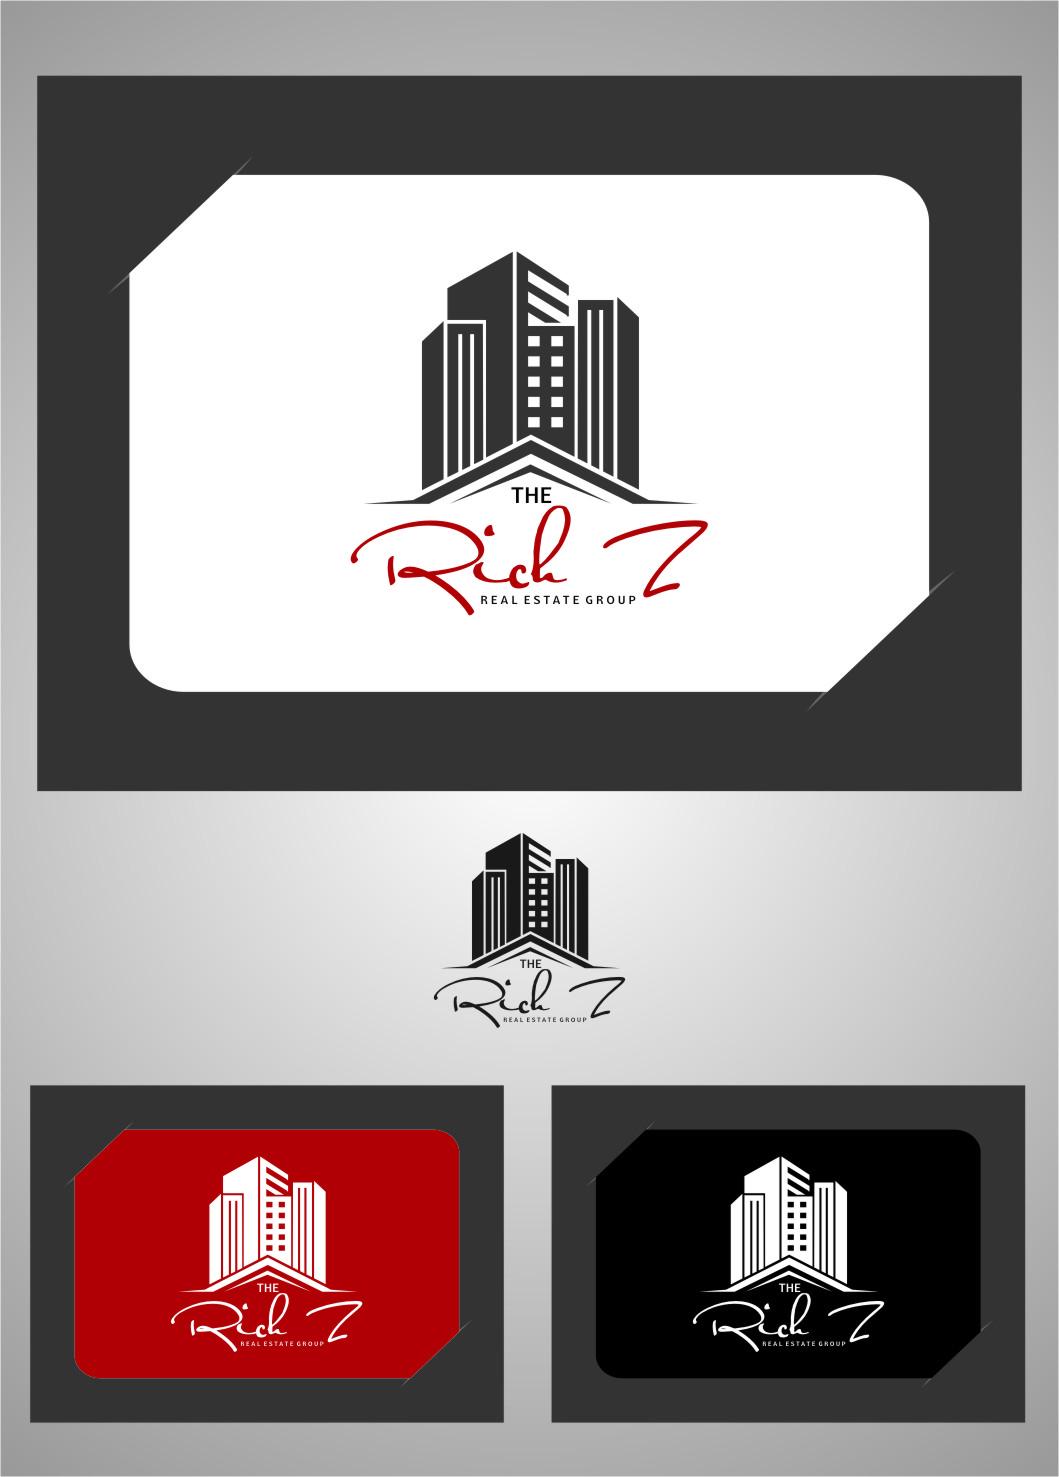 Logo Design by RasYa Muhammad Athaya - Entry No. 370 in the Logo Design Contest The Rich Z. Real Estate Group Logo Design.